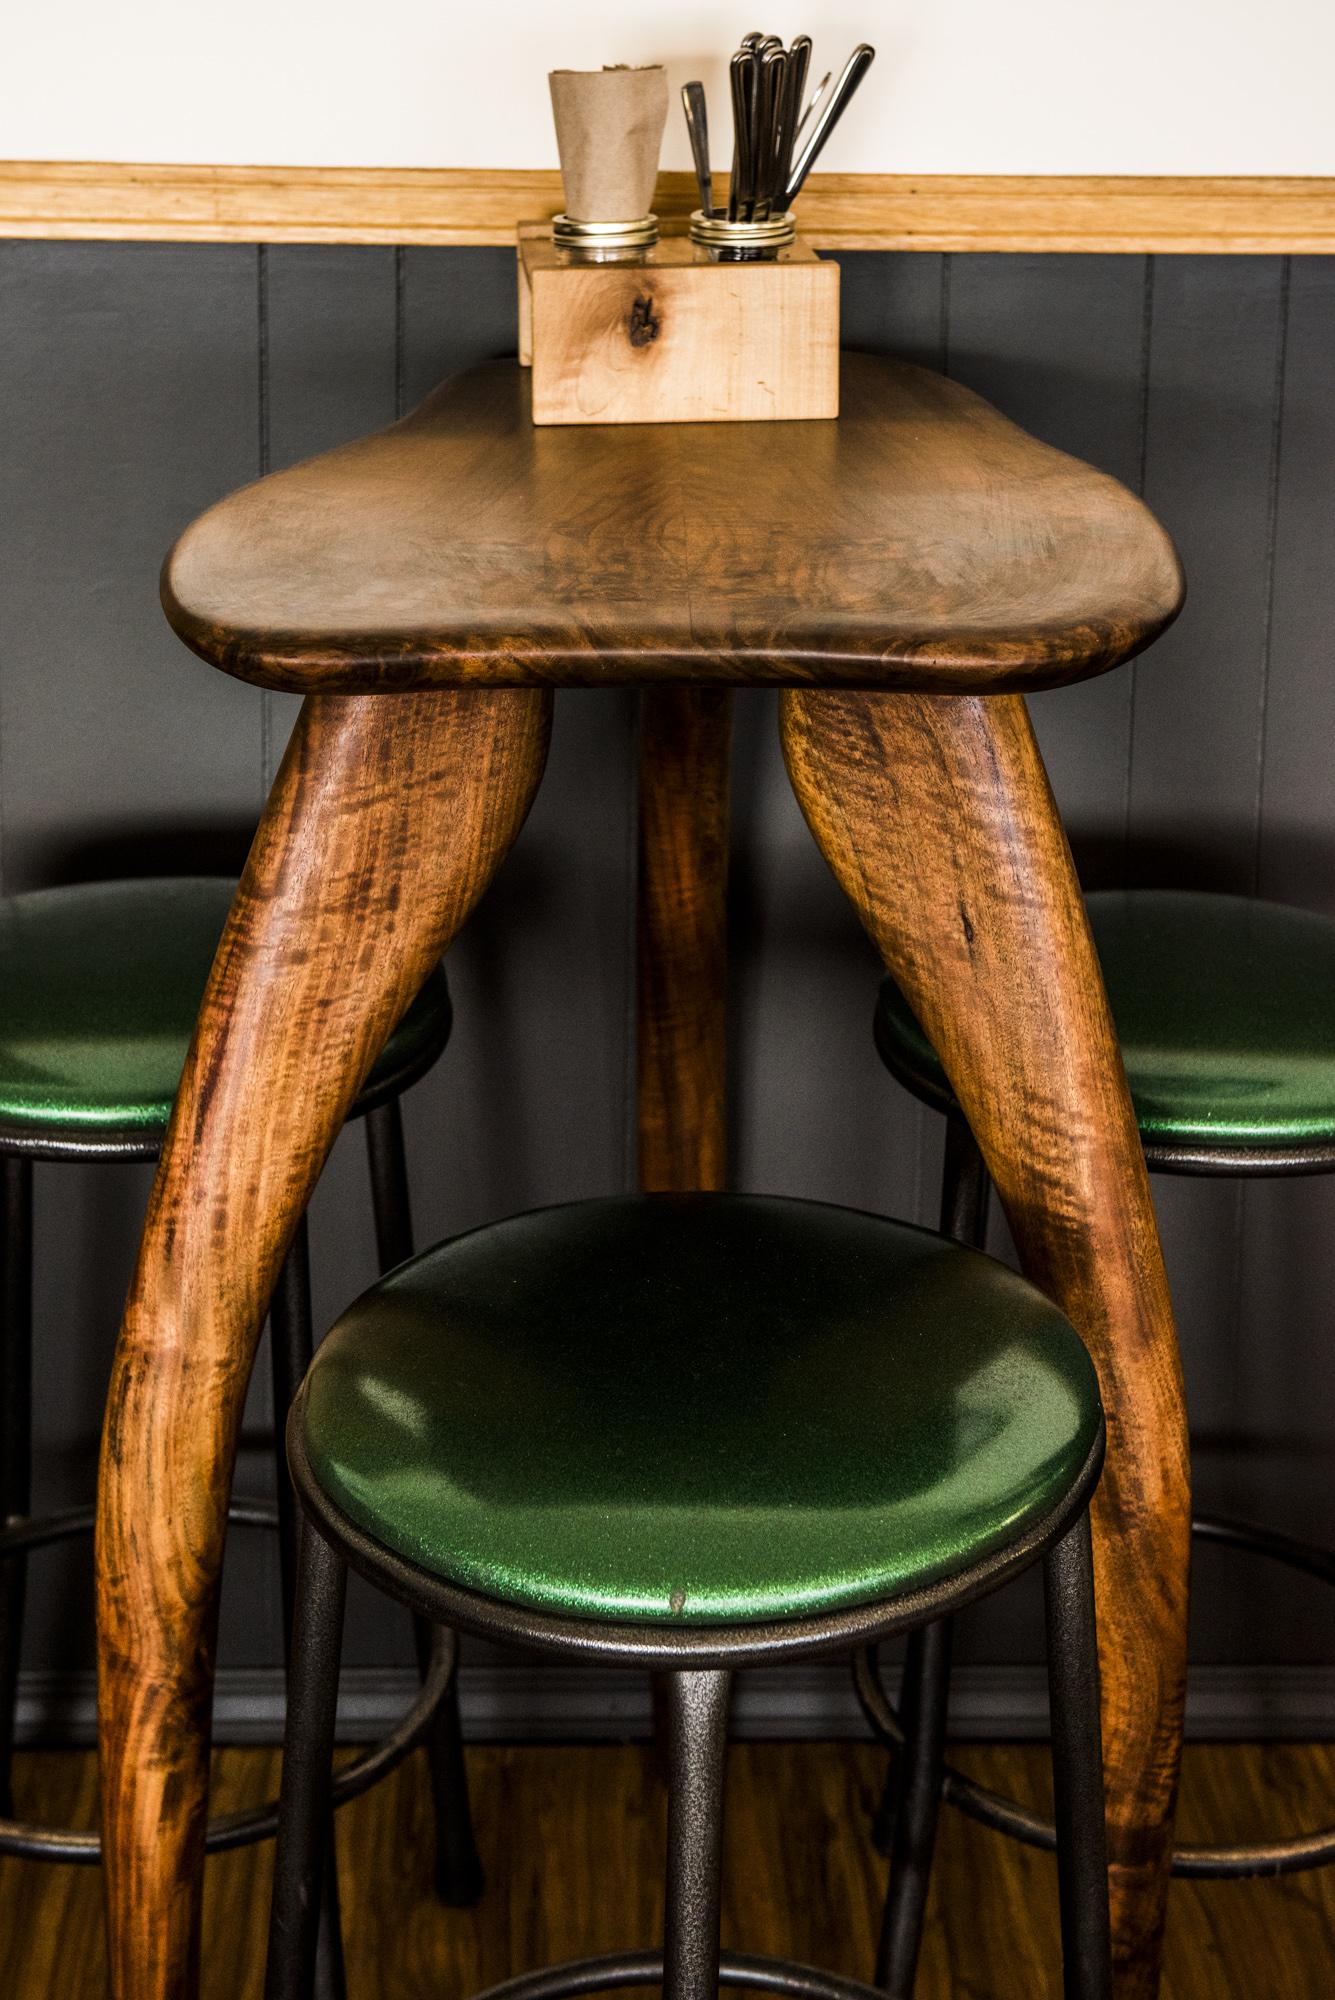 cabin-Latte table.jpg